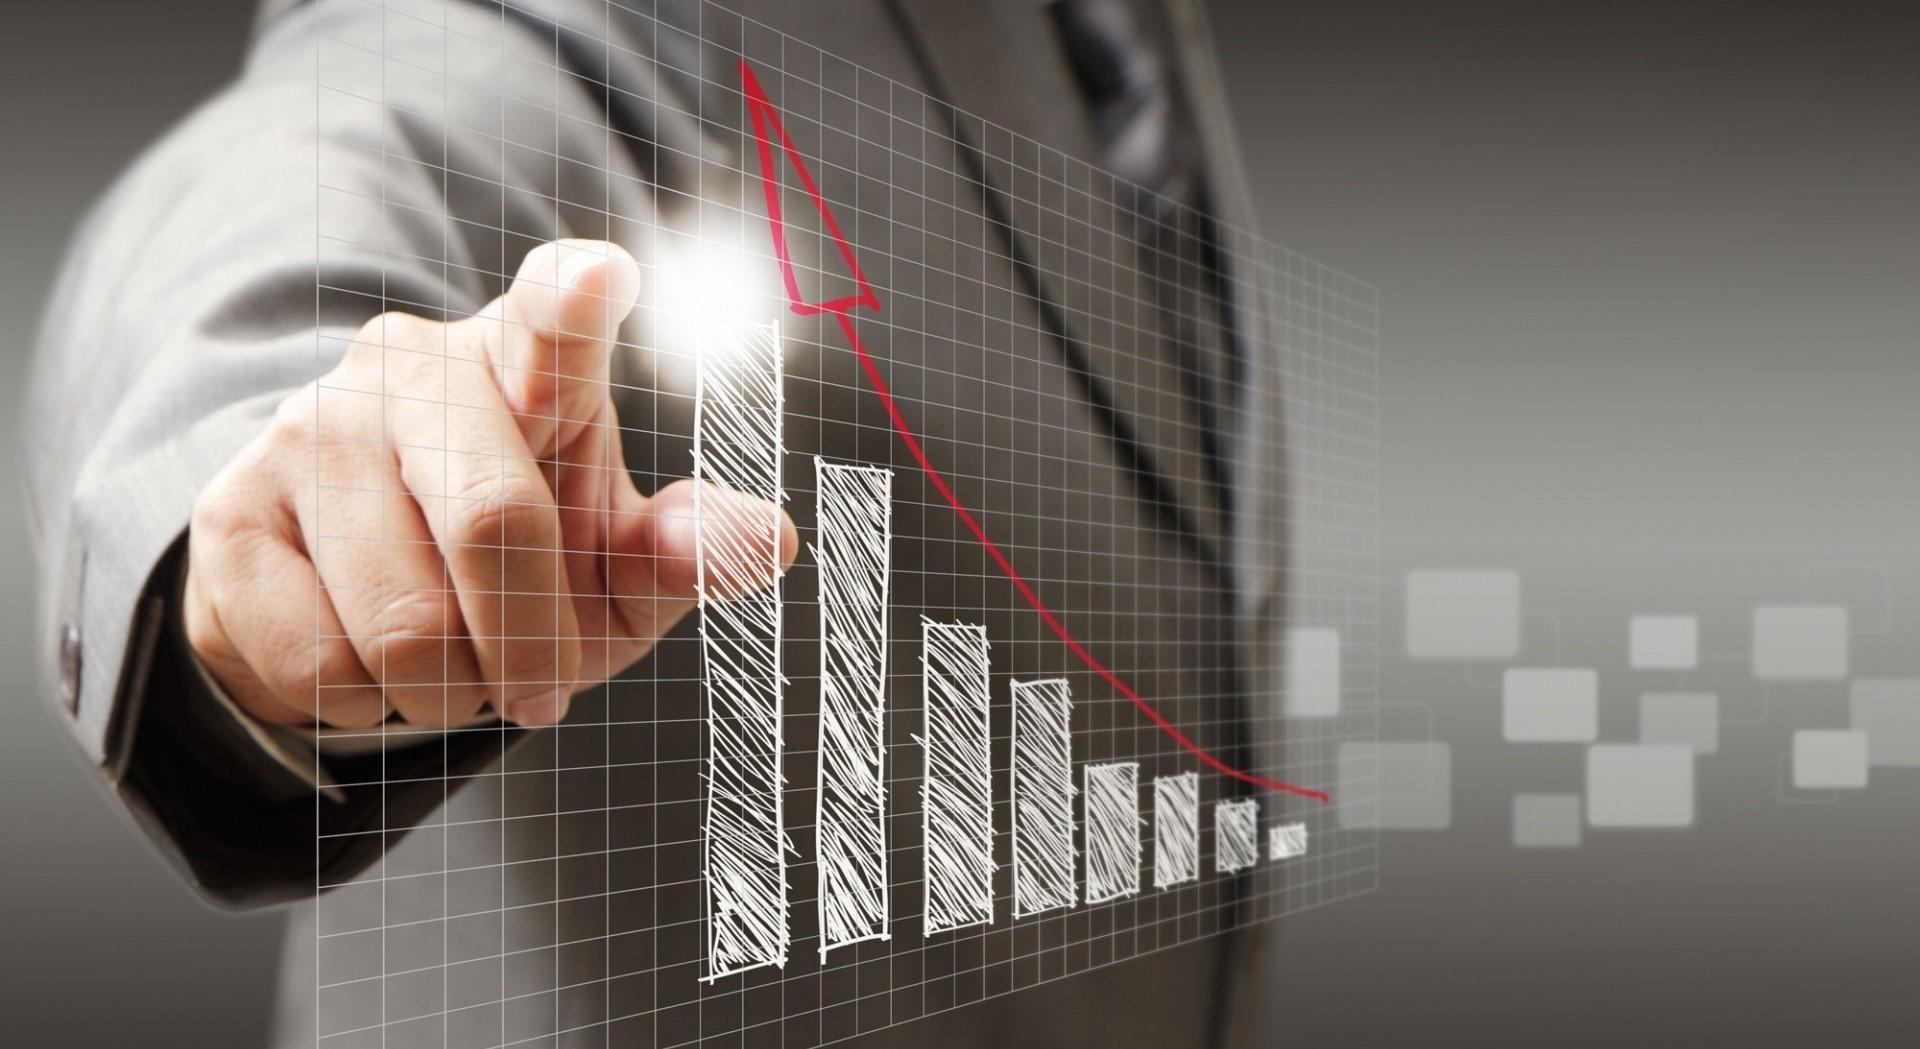 Strategi Pemasaran Produk dan Jasa Yang Meningkatkan Penjualan